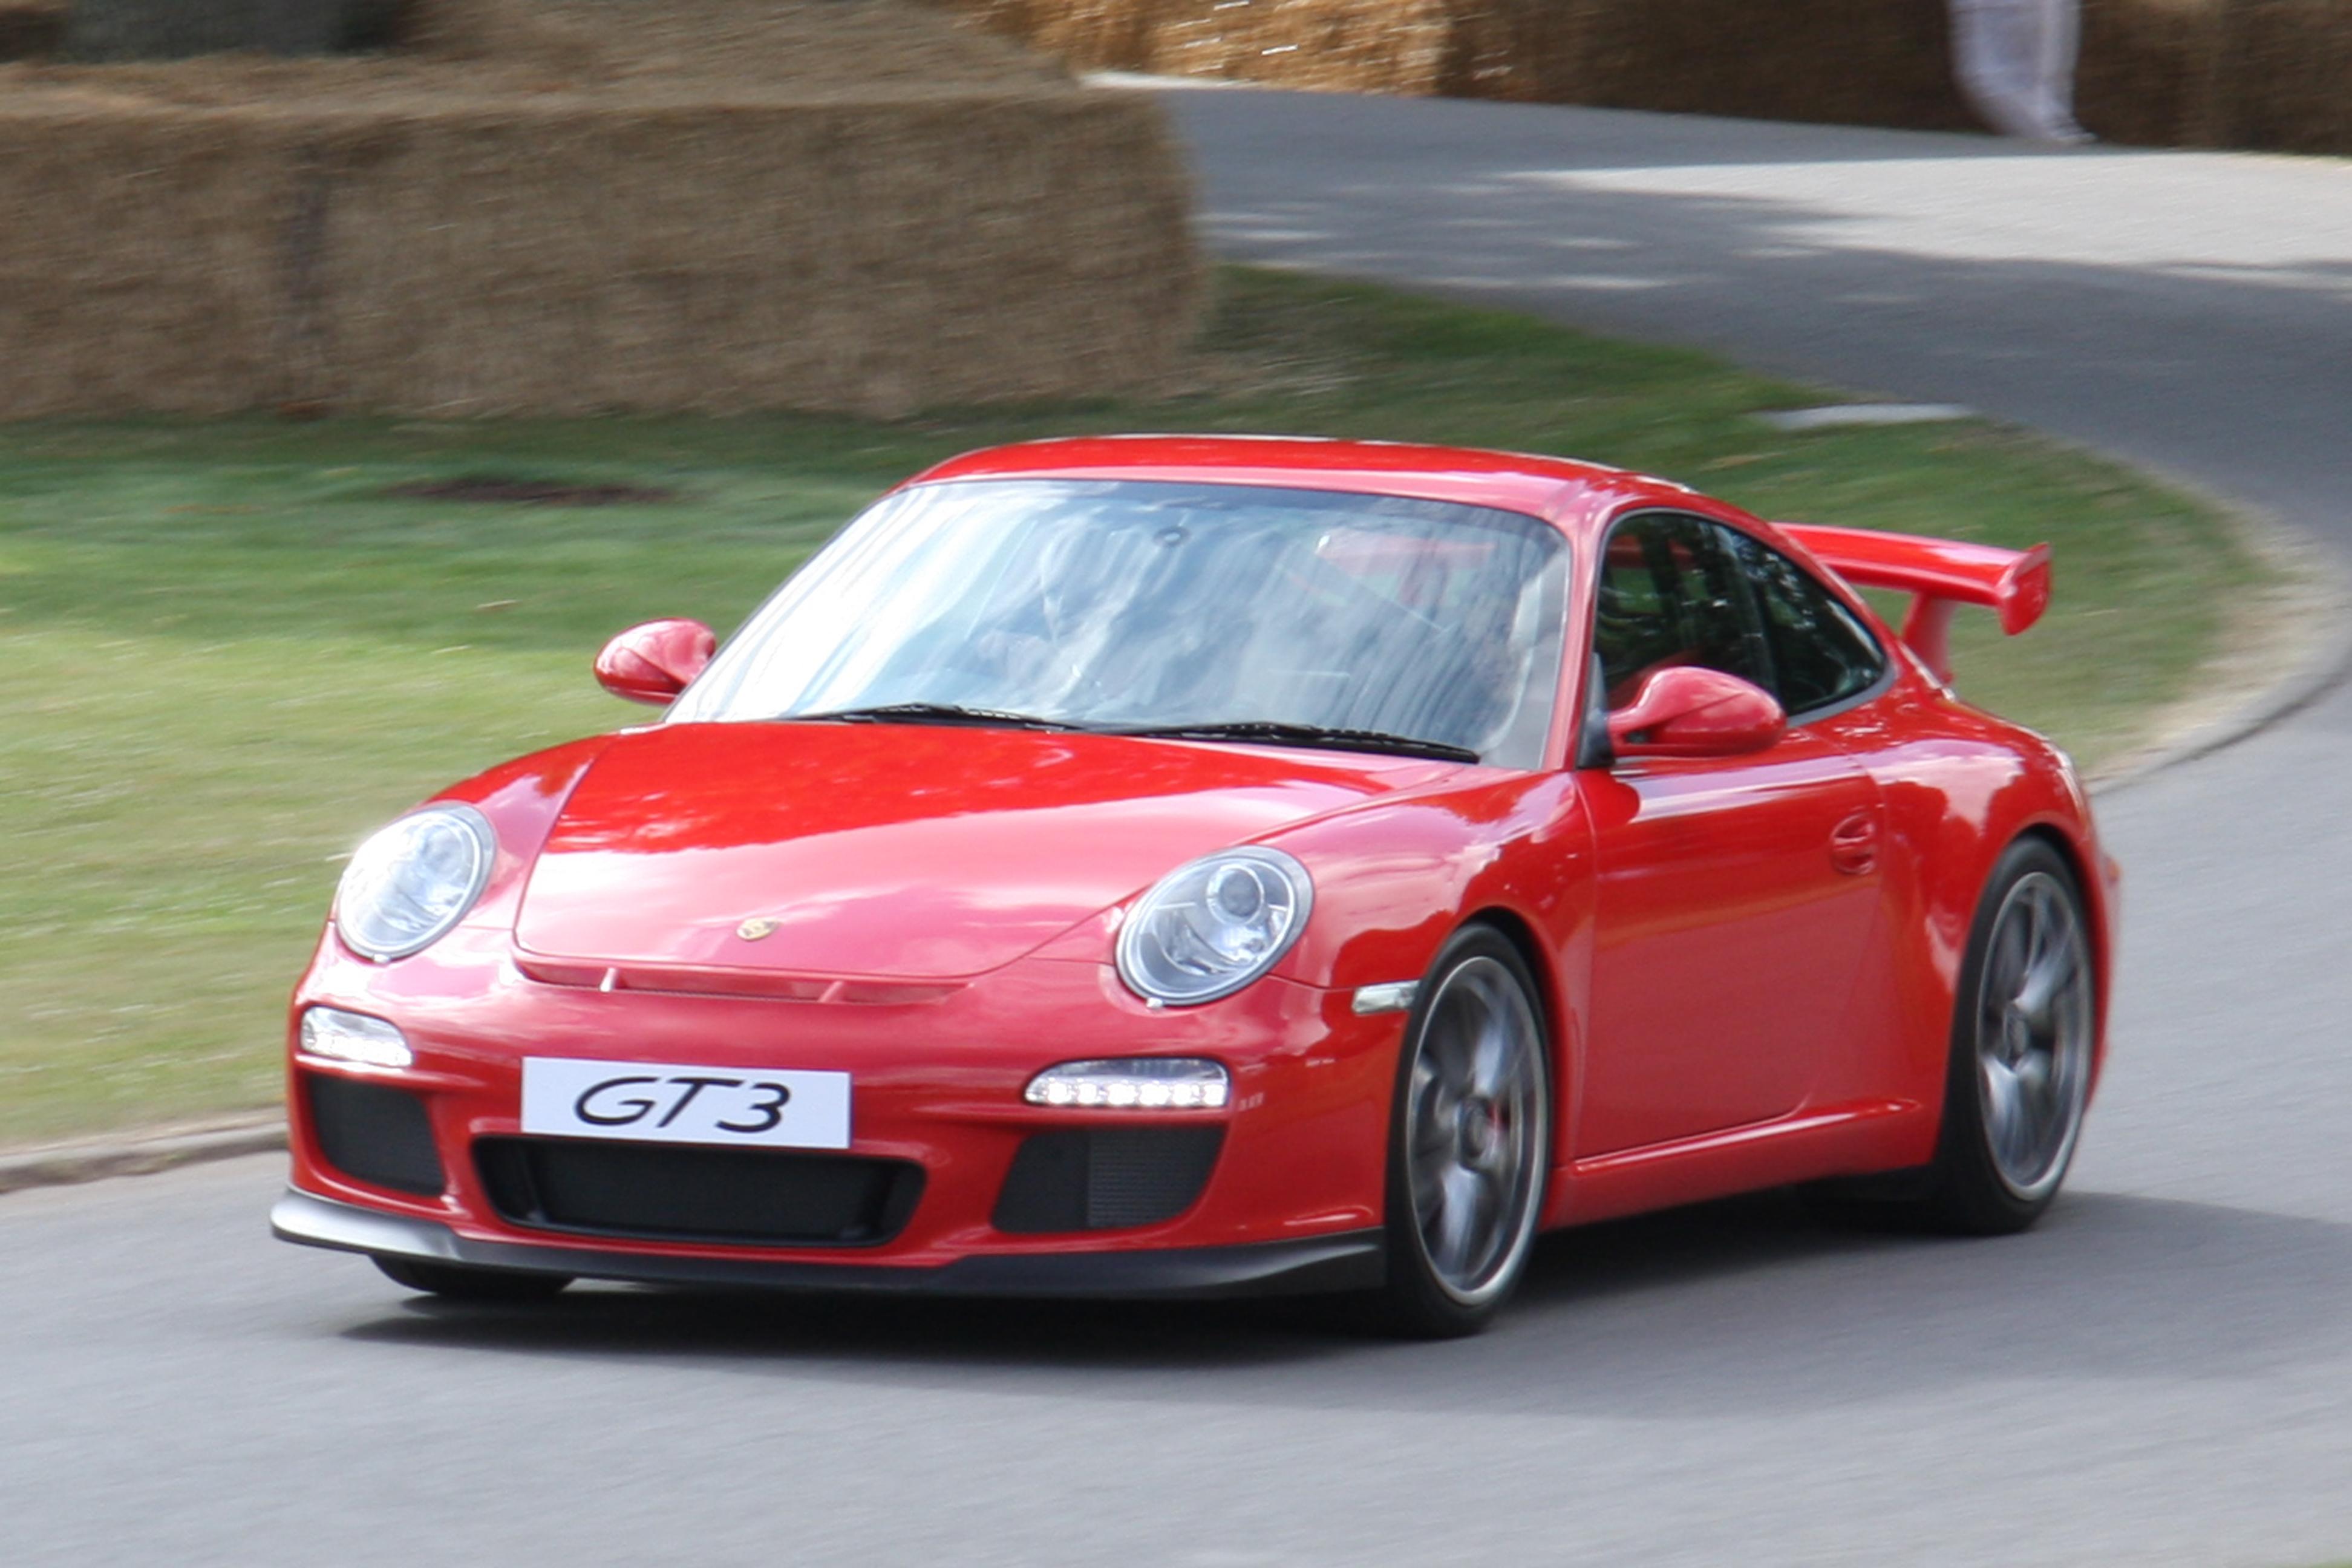 2009-07-05_red_Porsche_997_GT3_%28MY_2010%29_Goodwood Exciting Porsche 911 Gt2 La Centrale Cars Trend